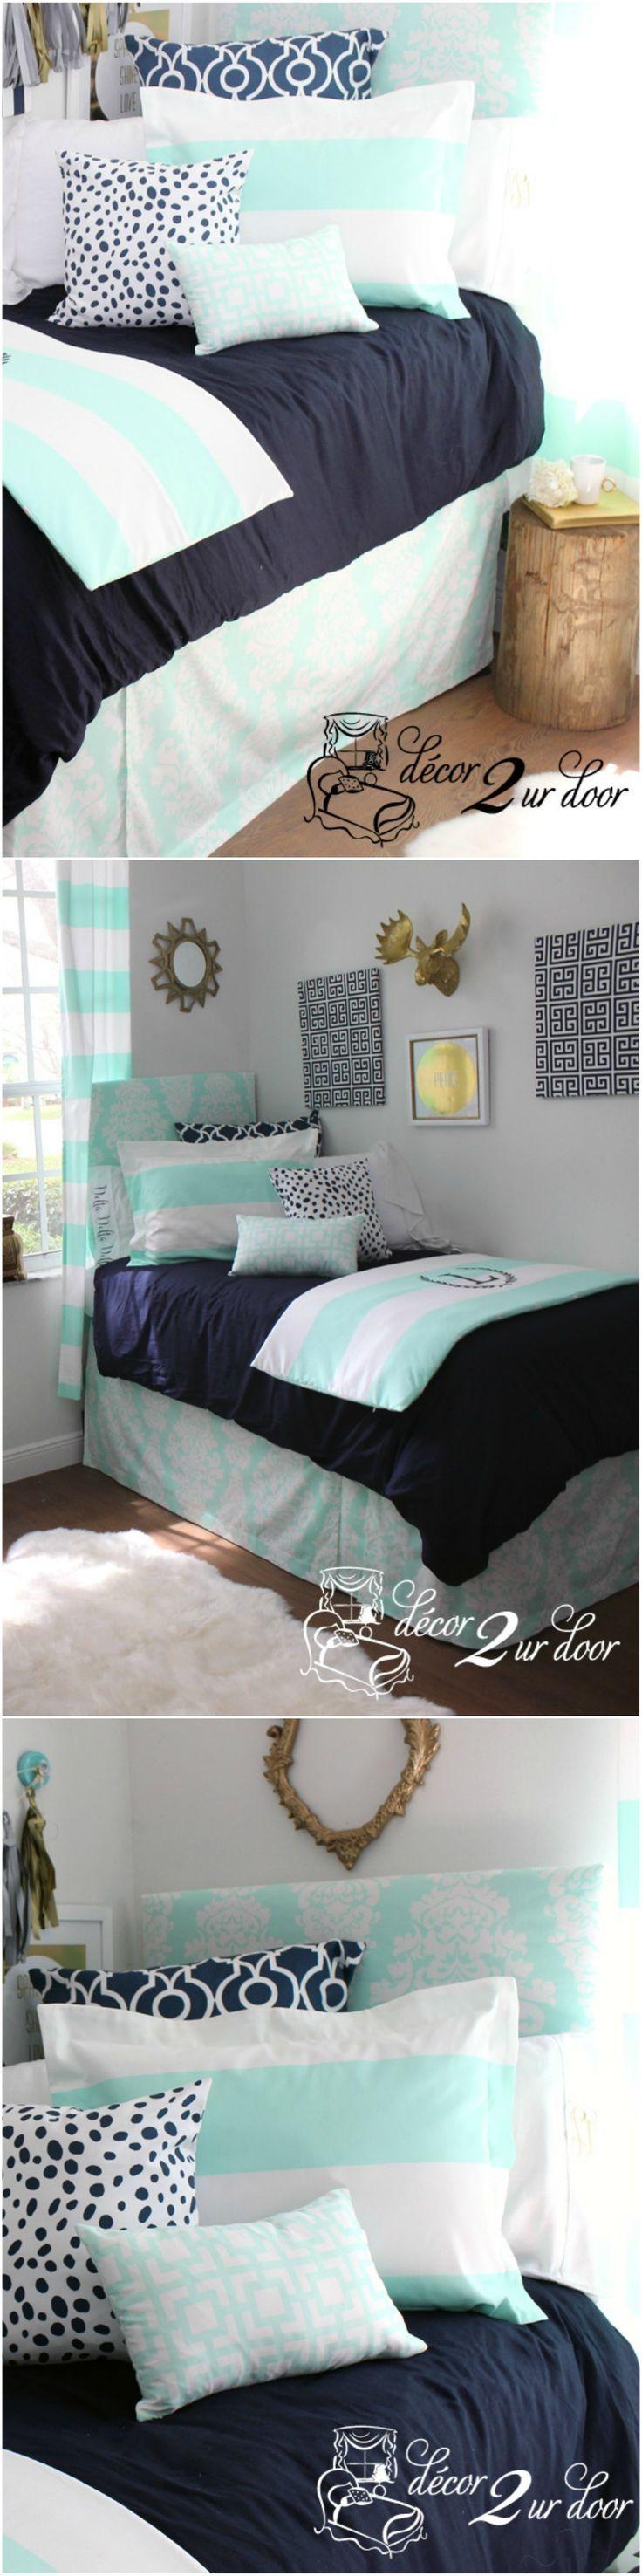 526 Best Images About Top Dorm Room Design Ideas On